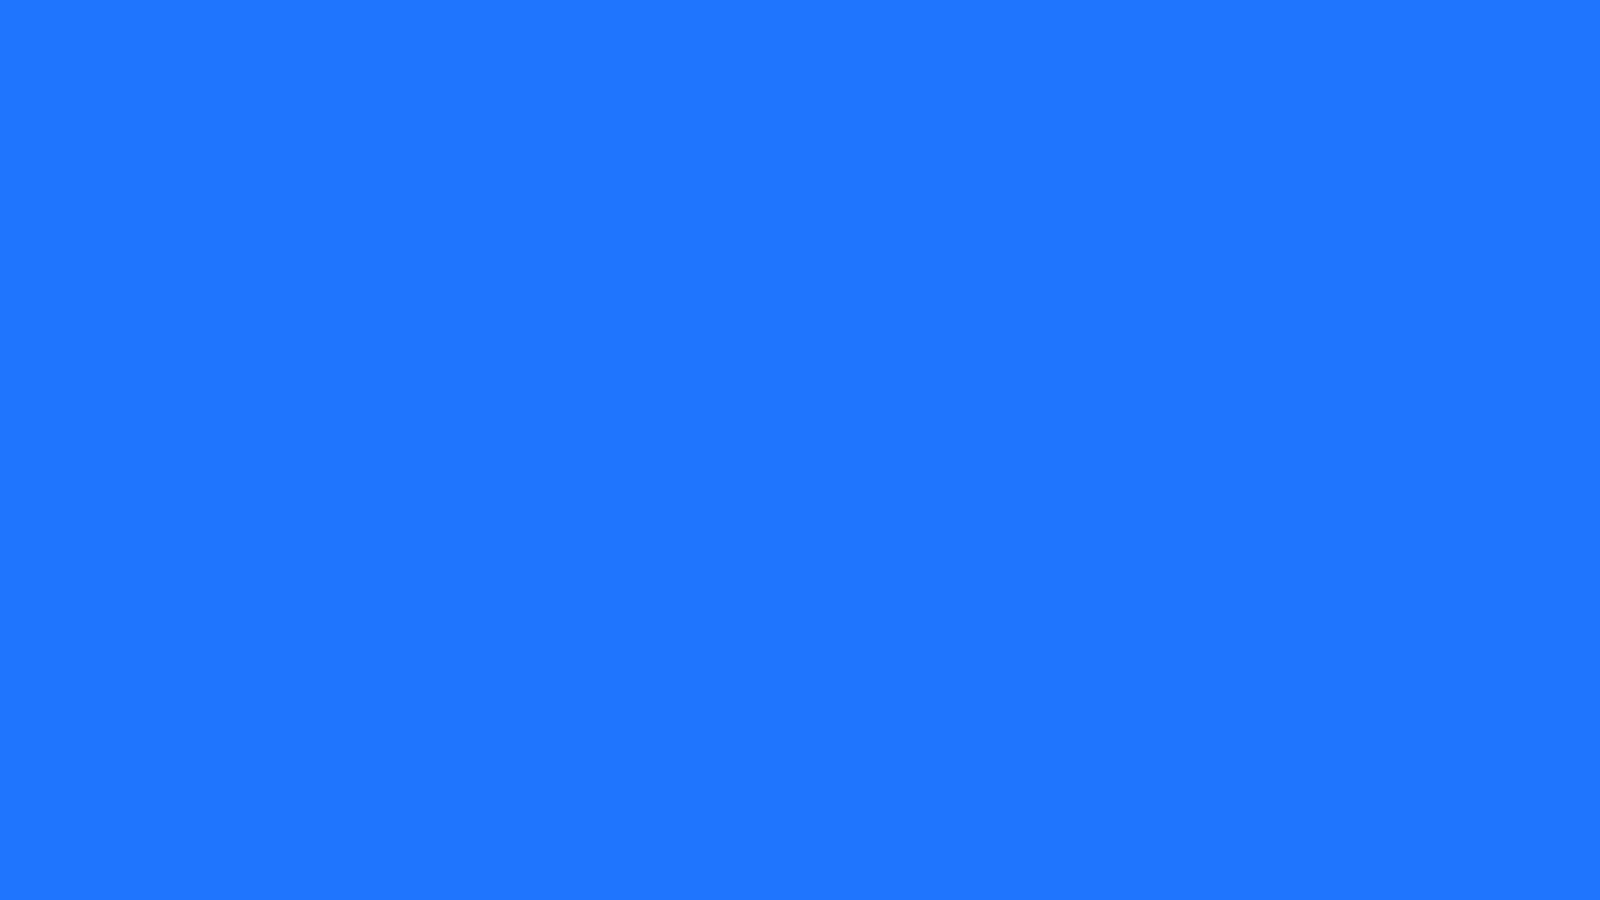 1600x900 Blue Crayola Solid Color Background